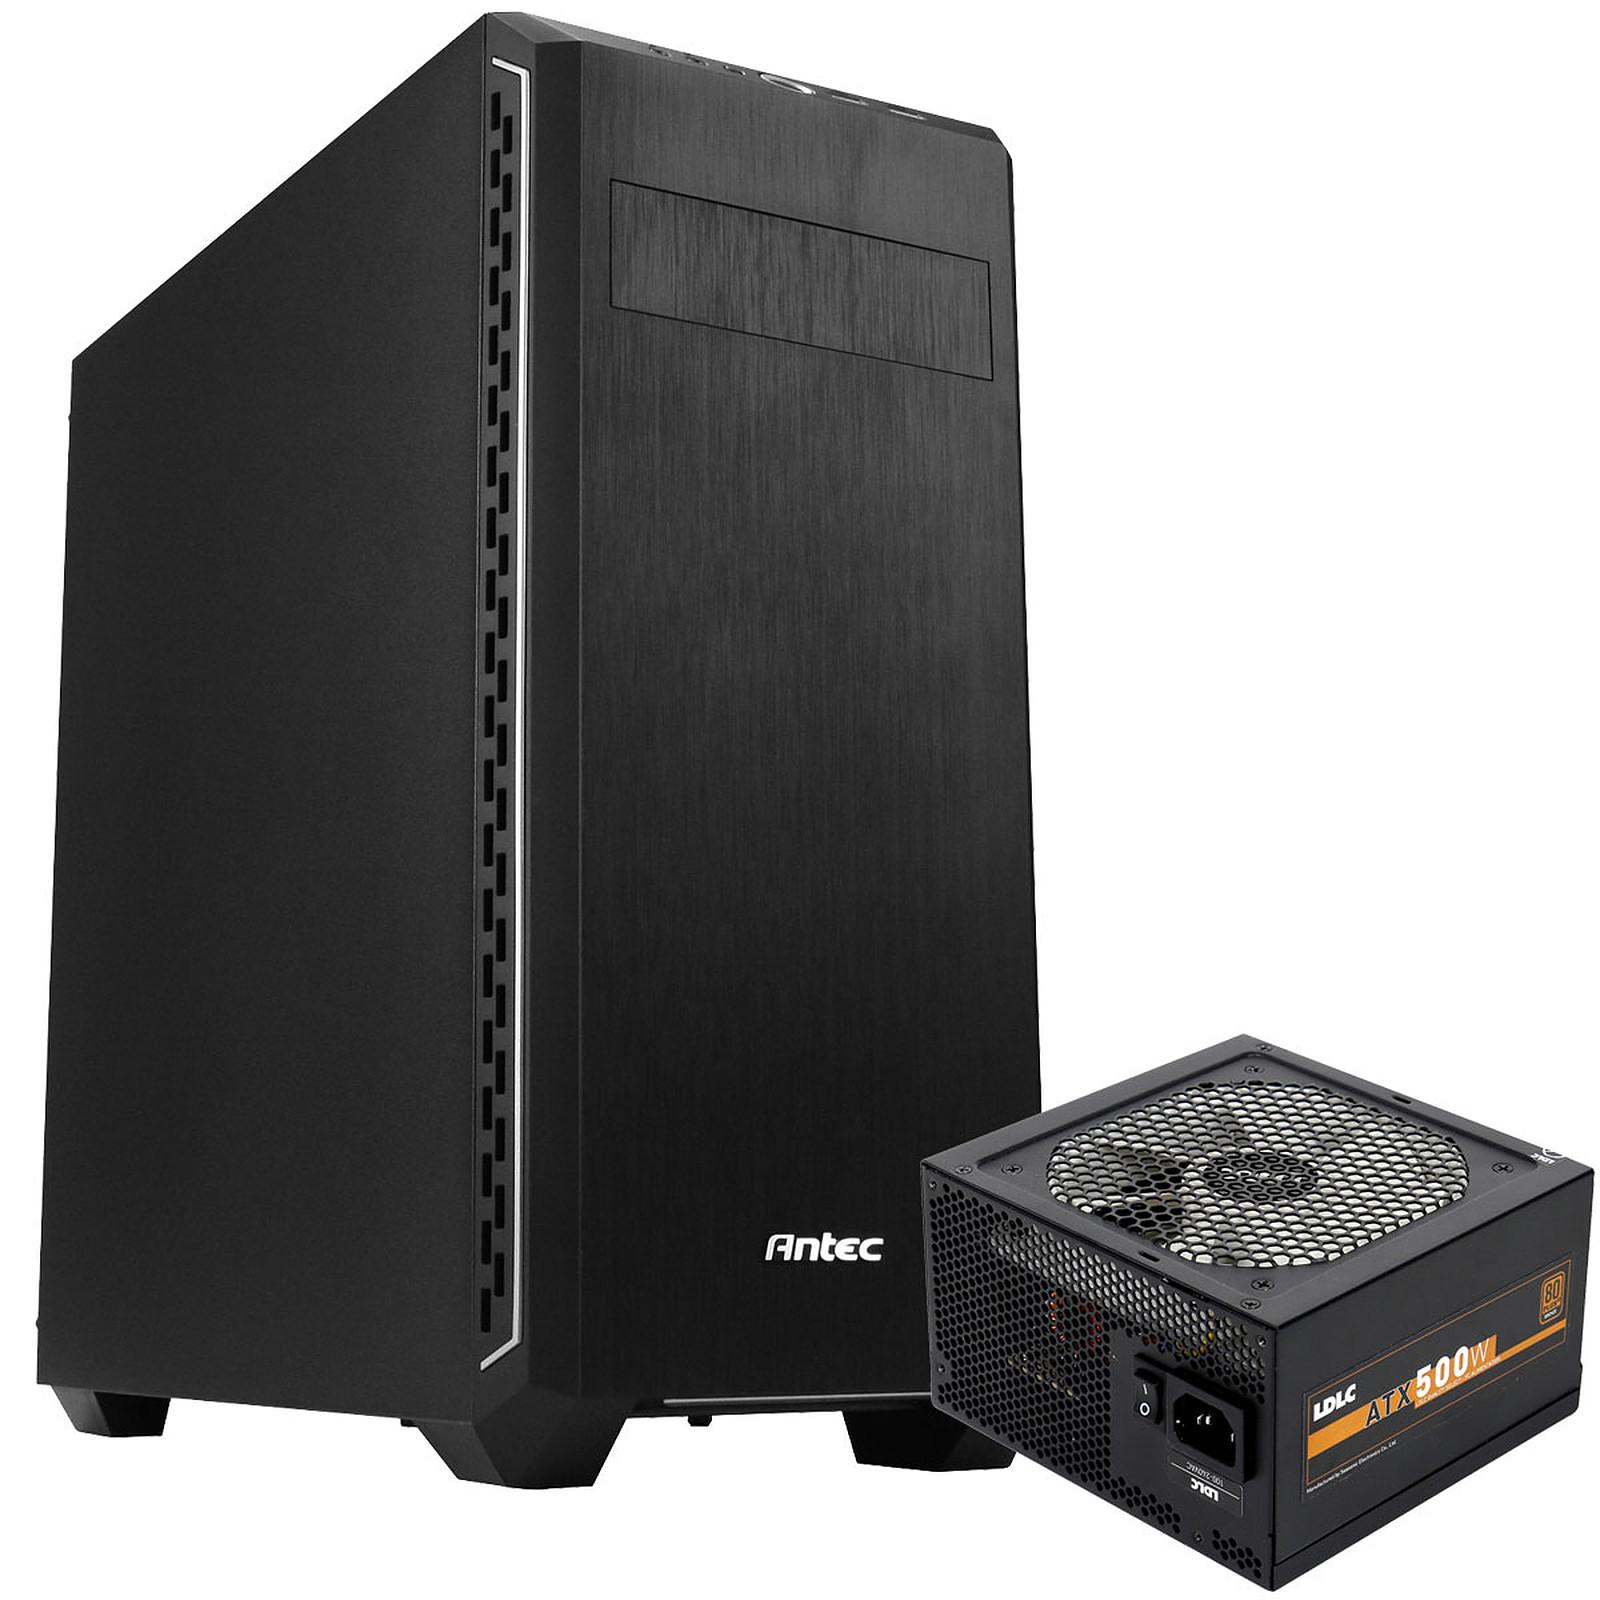 Antec P7 Silent + LDLC EC-500 Quality Select 80PLUS Bronze